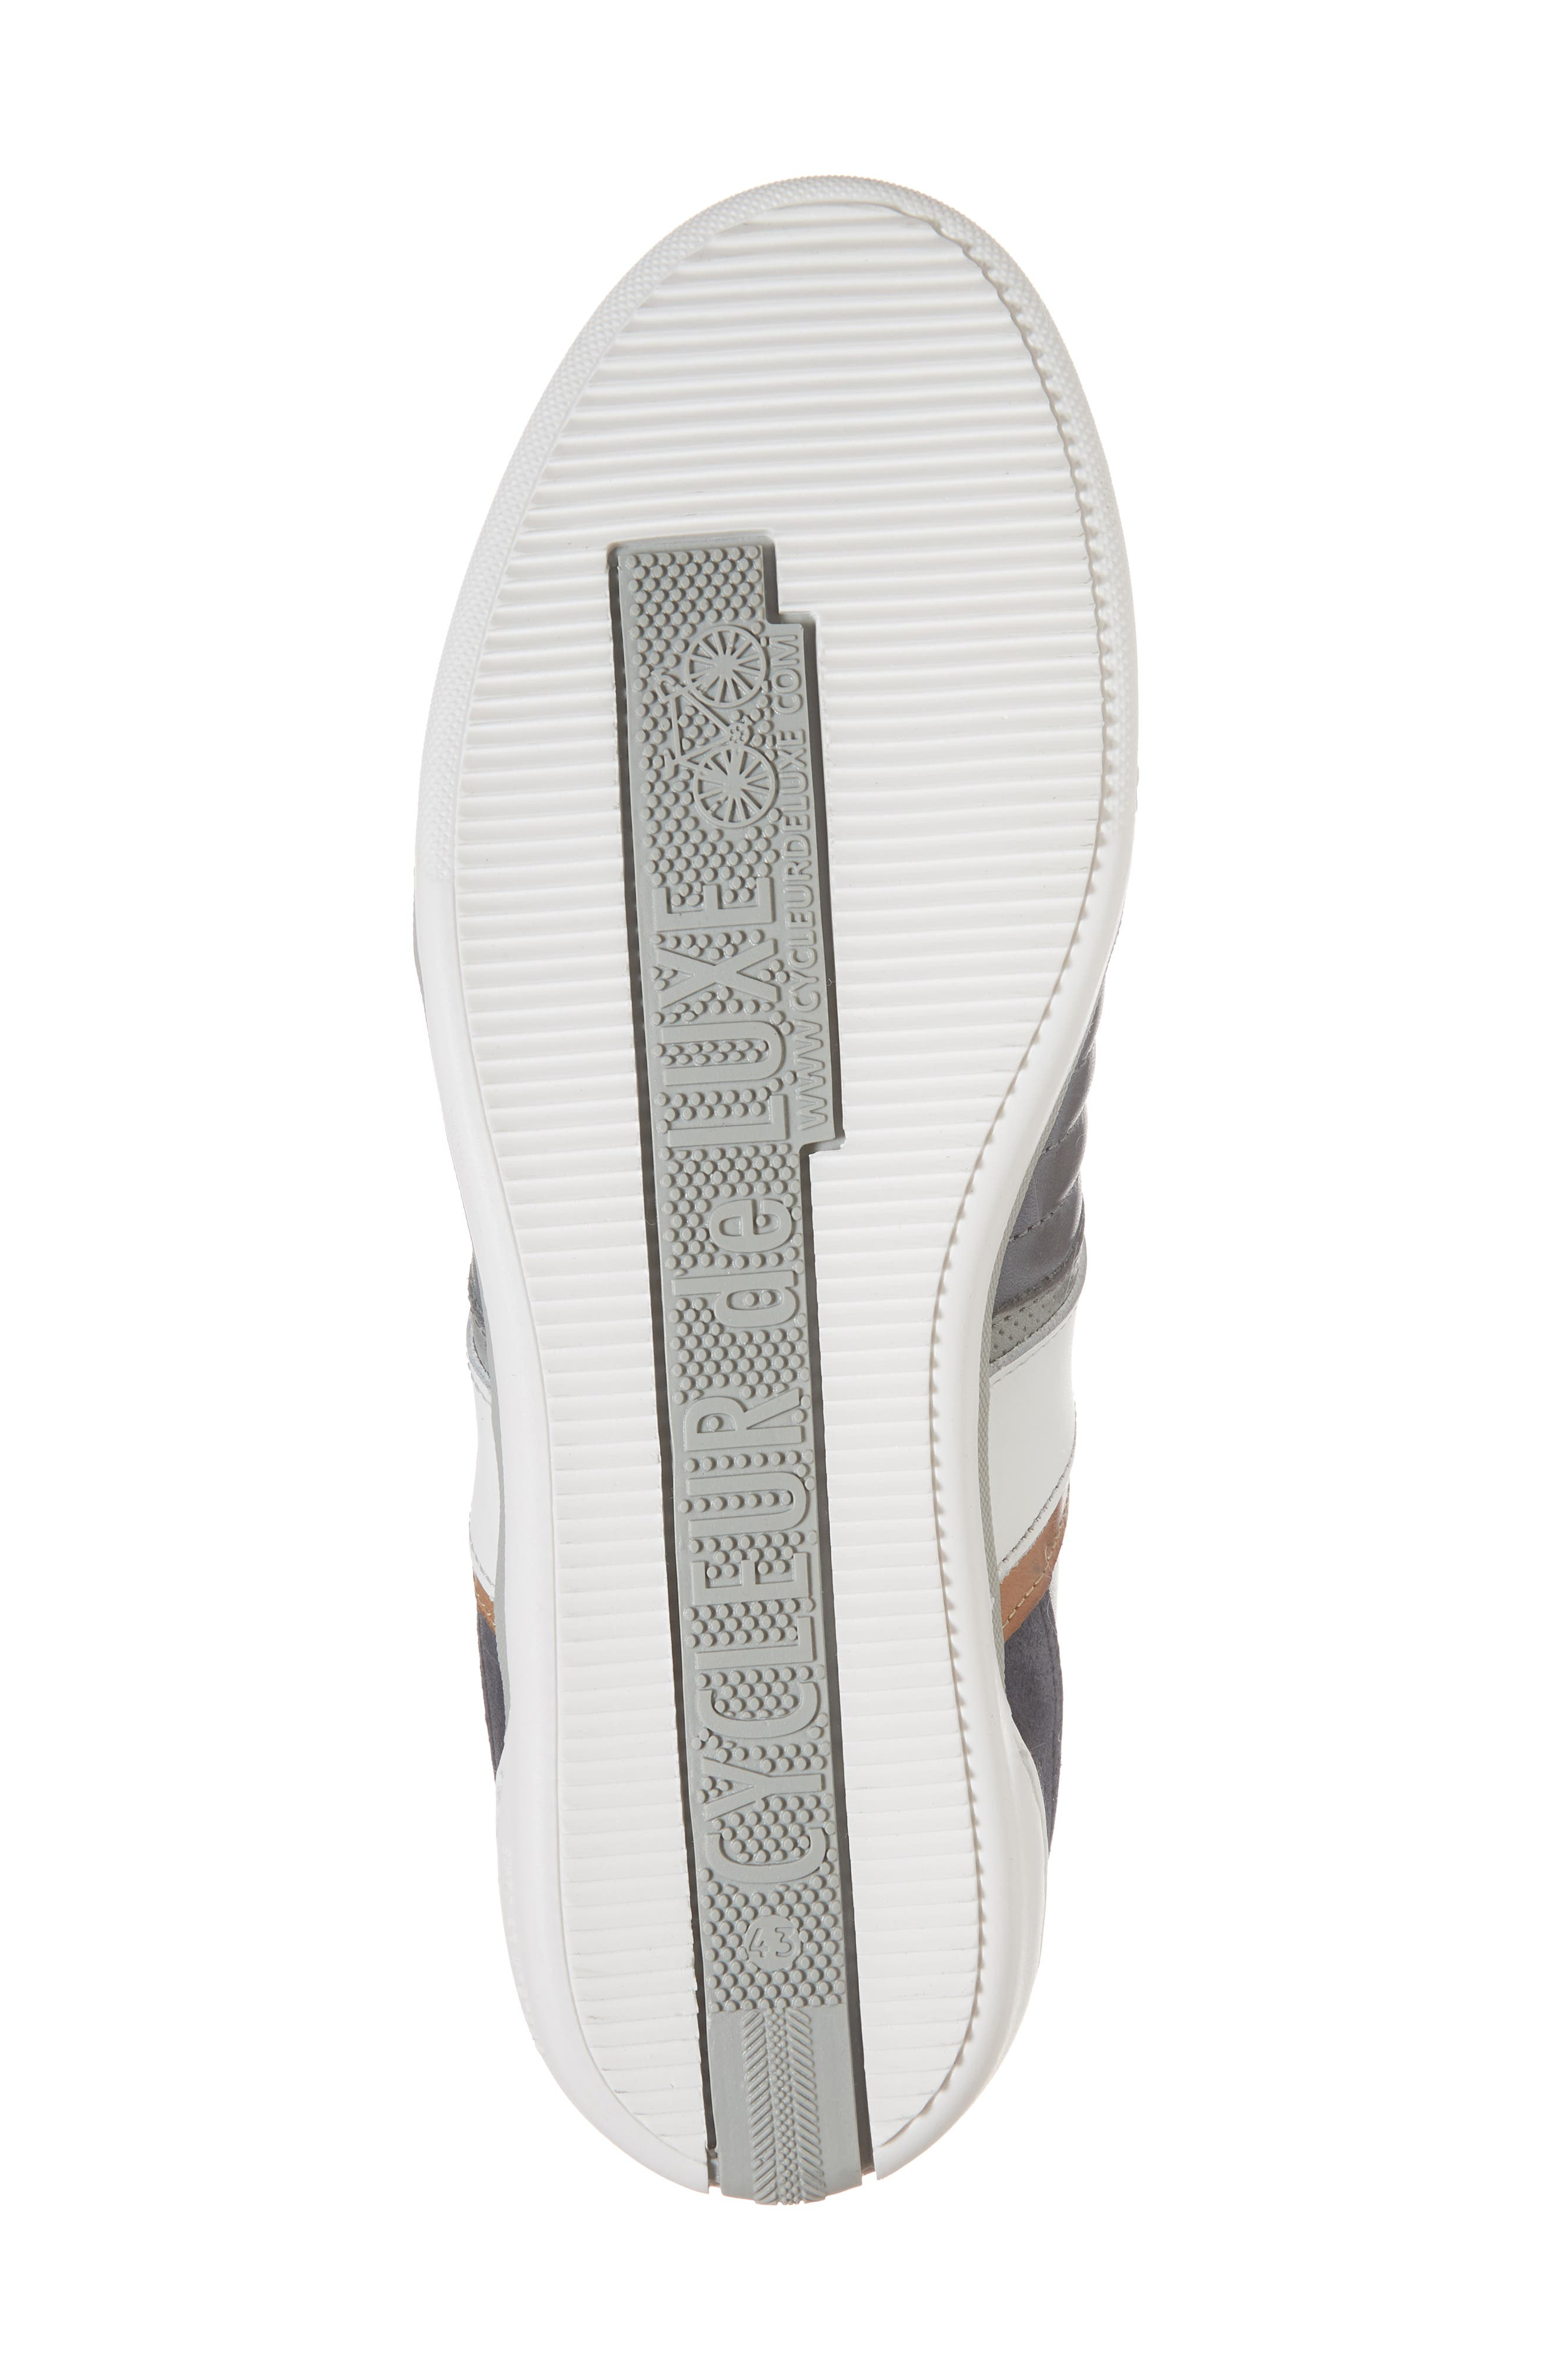 Solo Low Top Sneaker,                             Alternate thumbnail 6, color,                             Denim/ White/ Cognac Leather